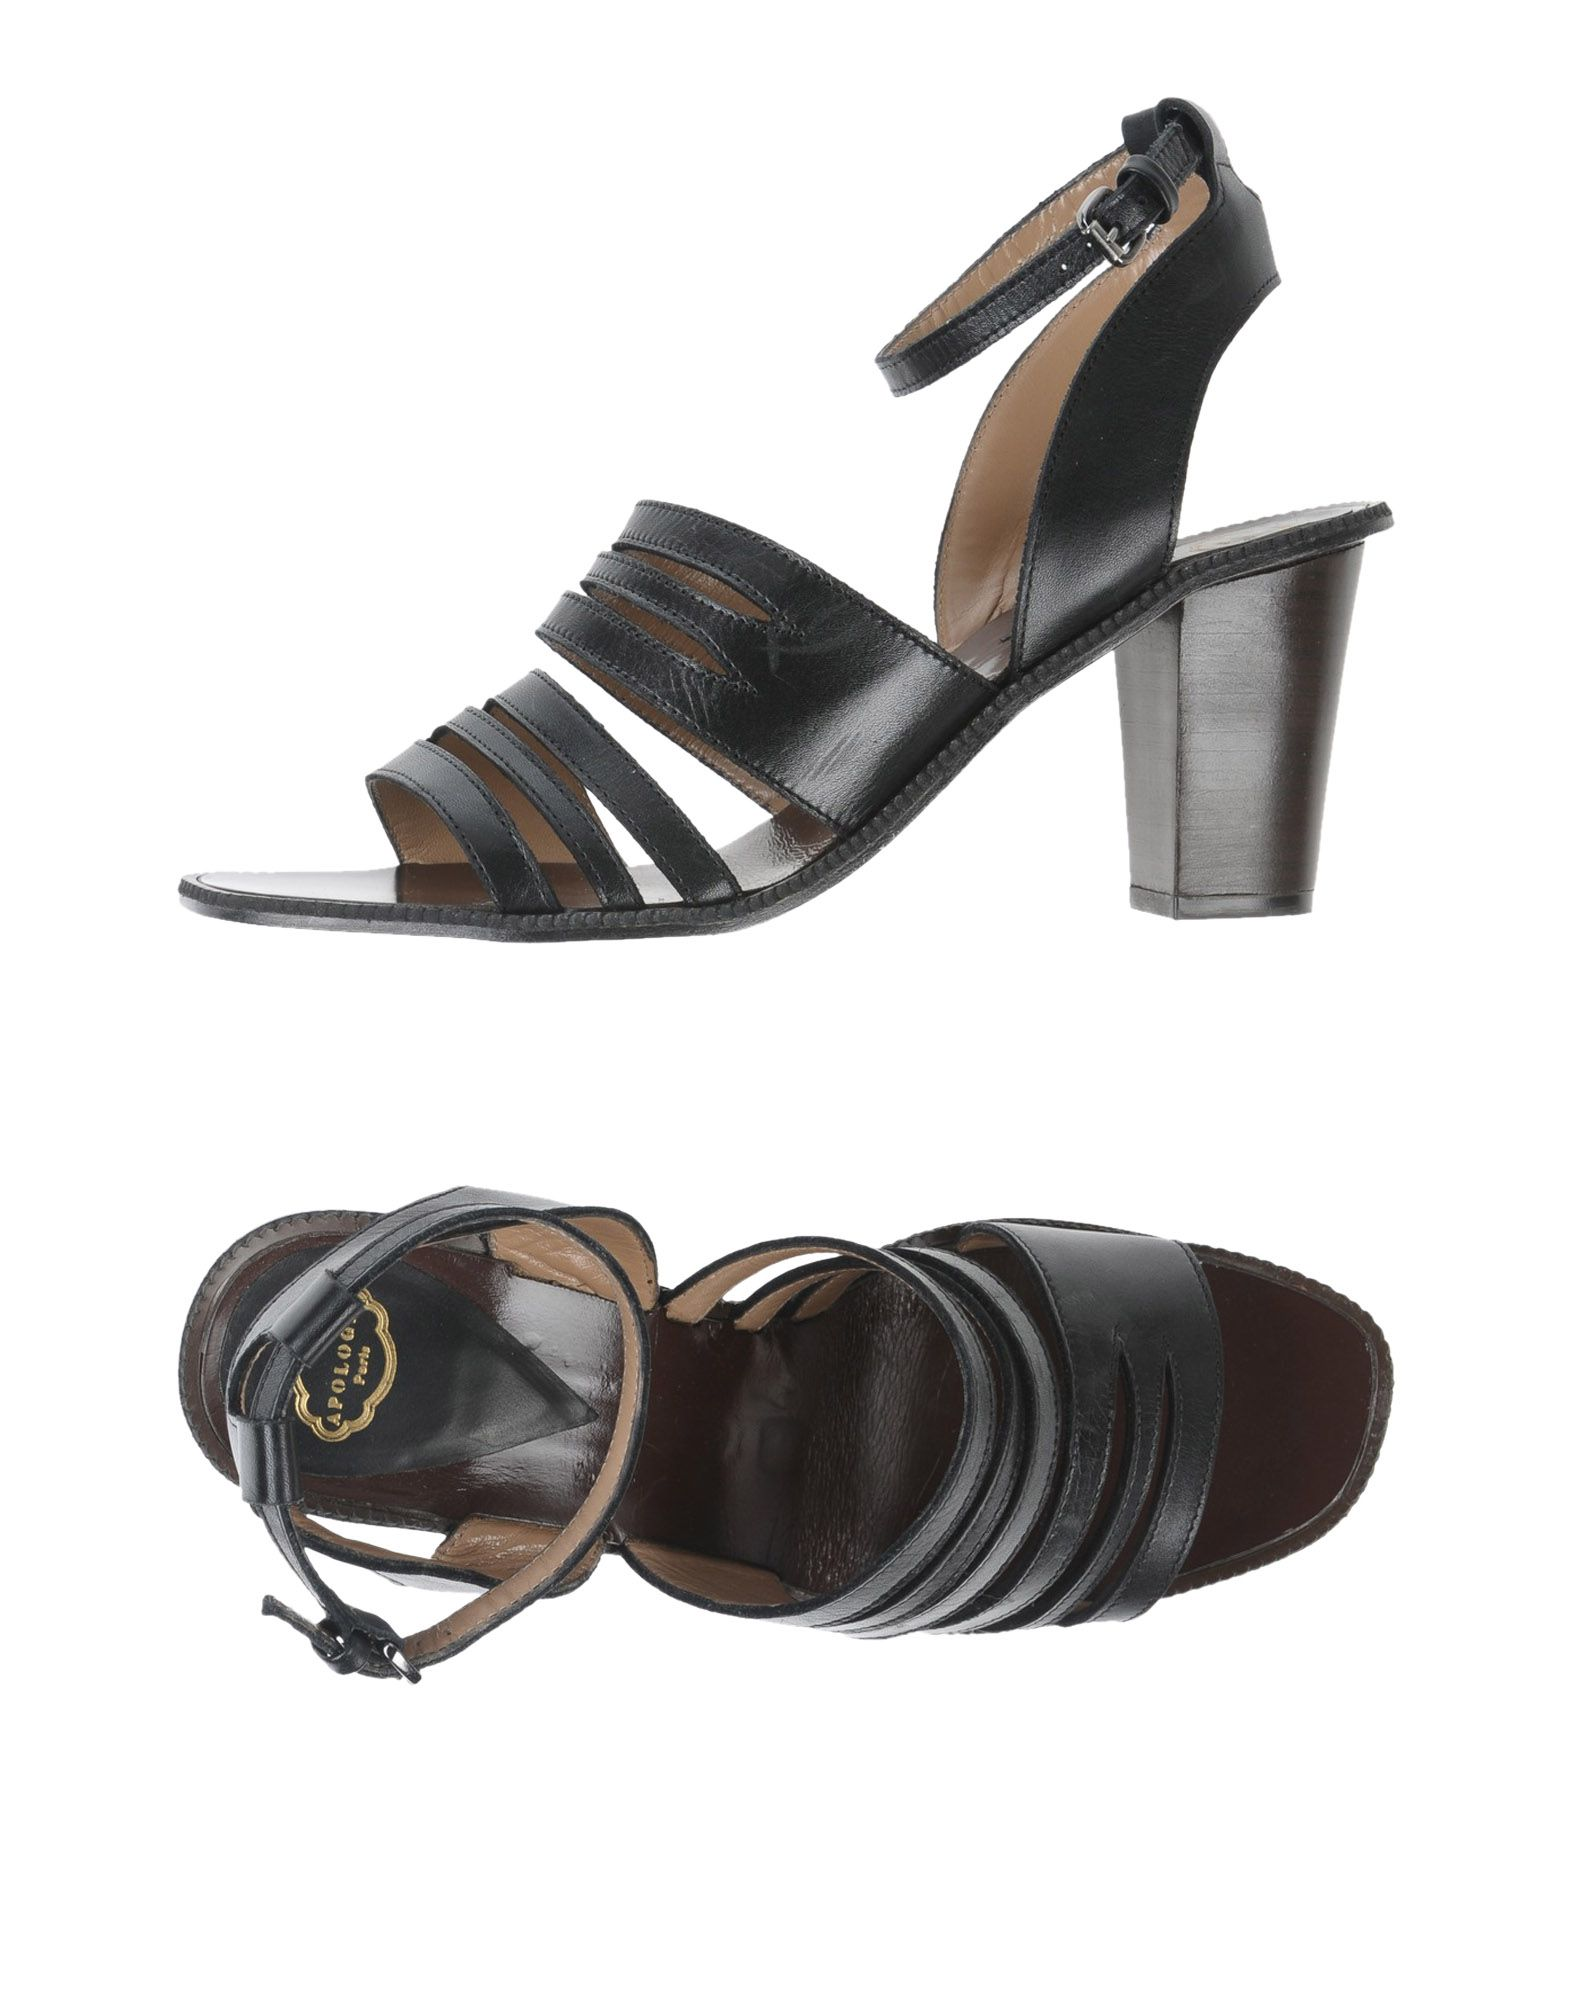 Apologie Sandalen Damen  11410724TE Gute Qualität beliebte Schuhe